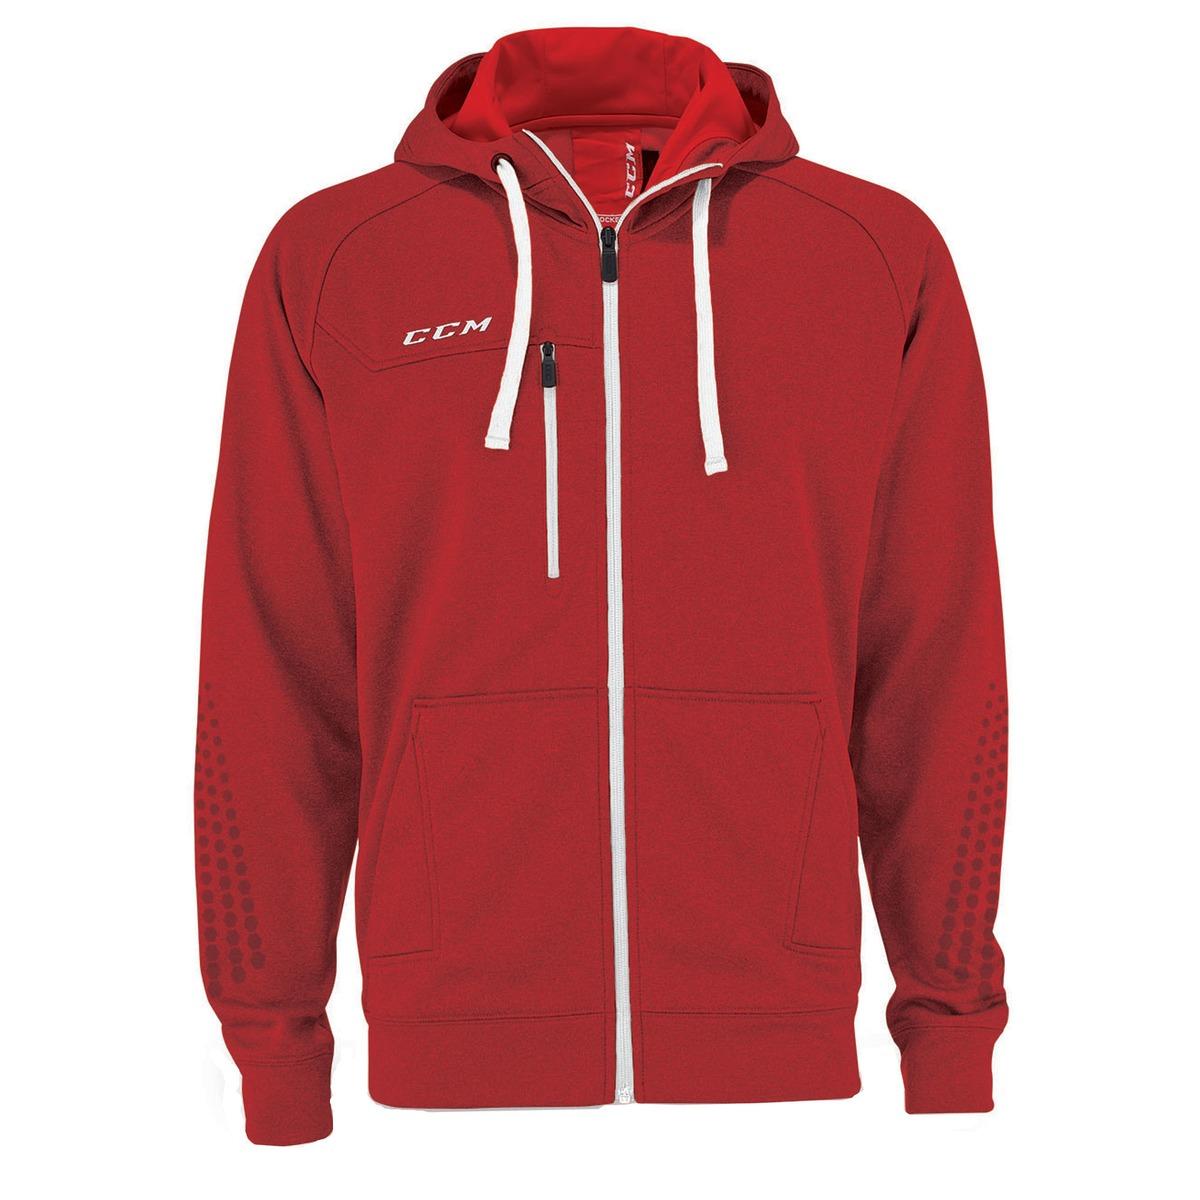 4ca7c05e6 Buy Treningsjakke. Shop every store on the internet via PricePi.com